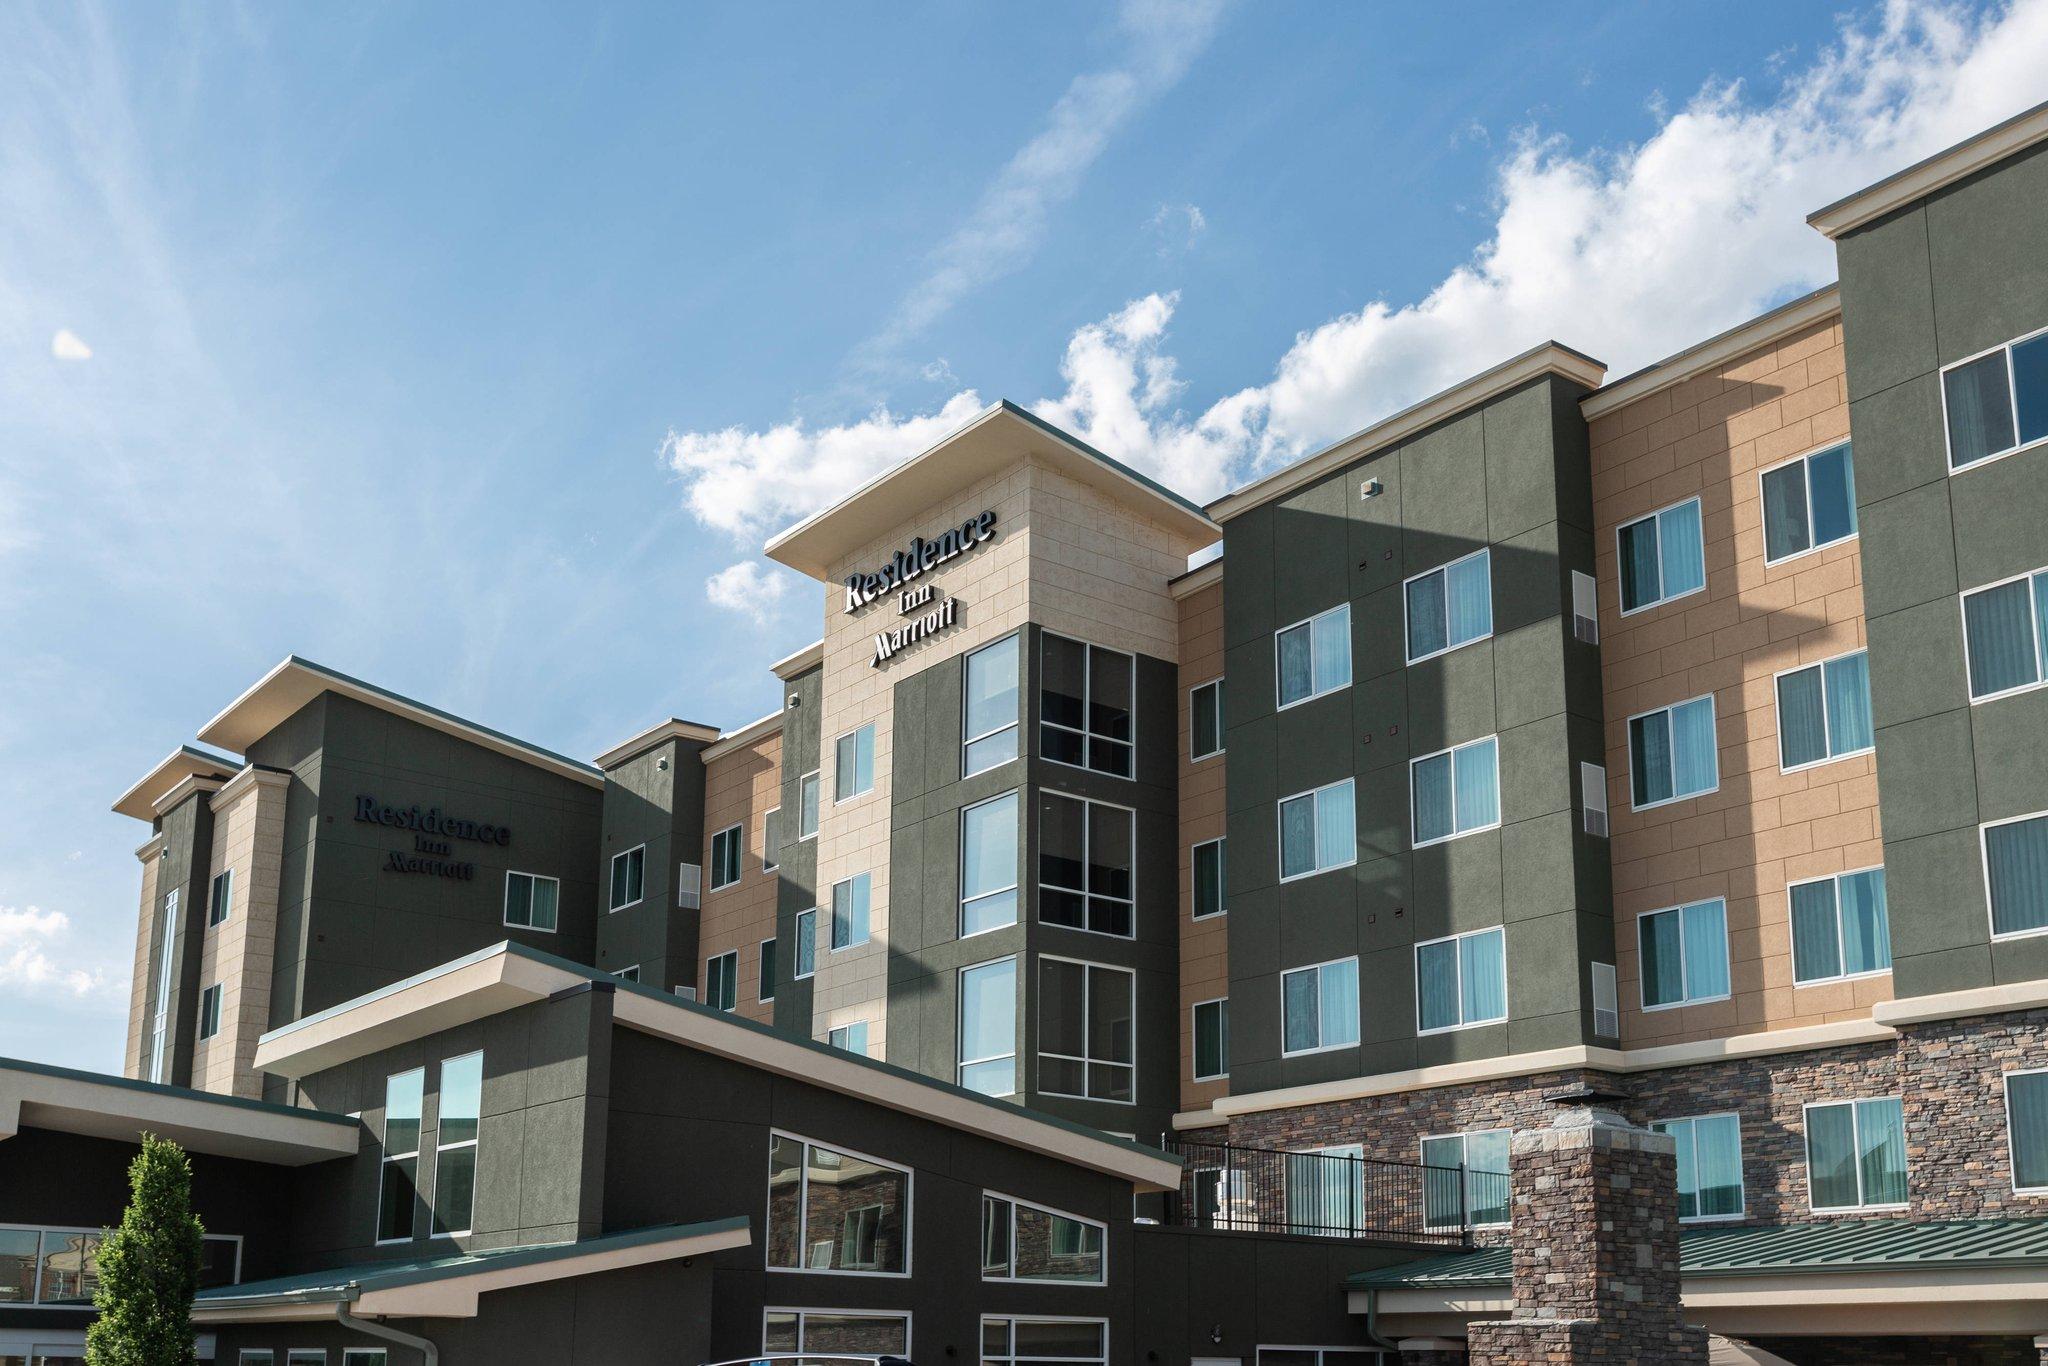 Residence Inn by Marriott Oklahoma City North-Quail Springs